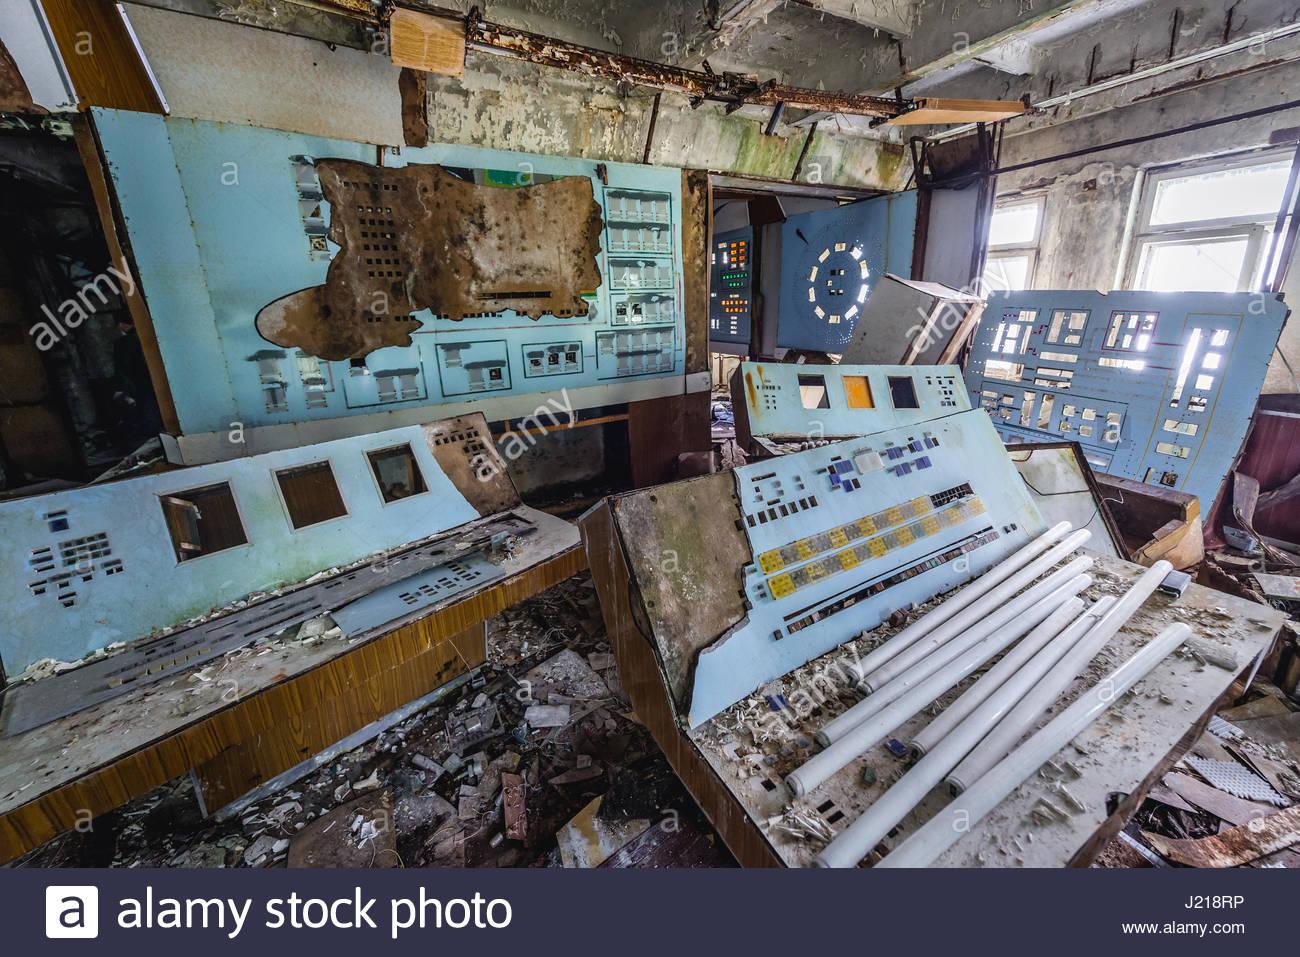 control-room-in-command-centre-building-of-soviet-duga-radar-system-J218RP.jpg